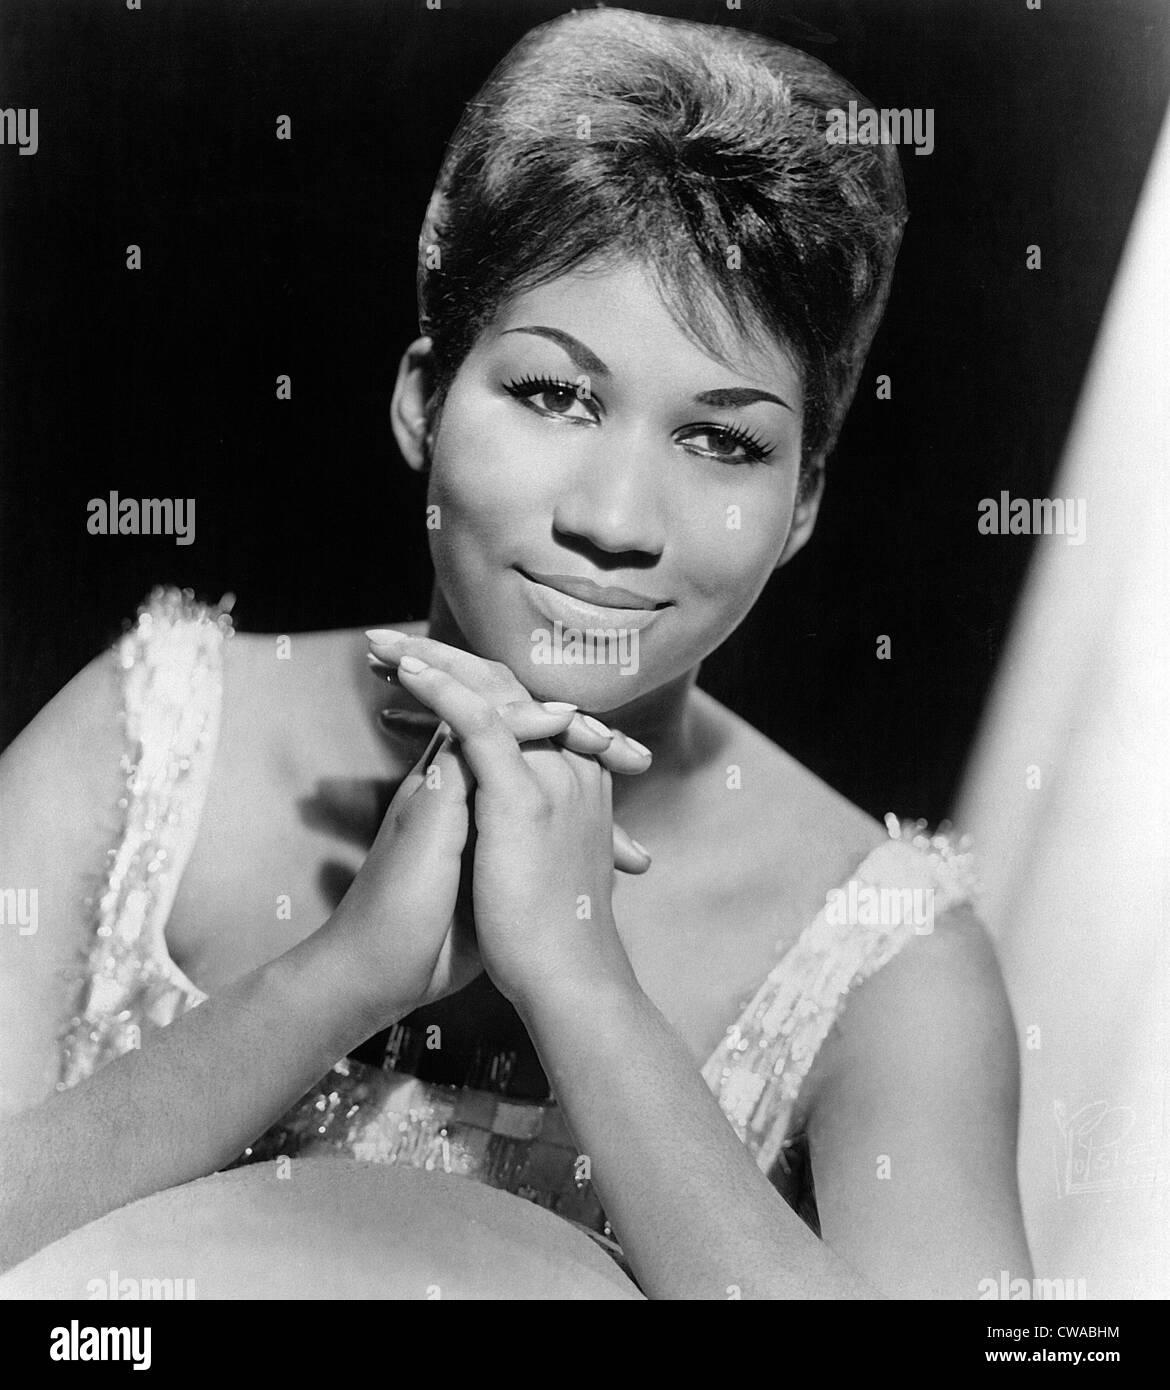 ARETHA FRANKLIN, 1964, Columbia Records publicity portrait. CSU Archives/Everett Collection. - Stock Image